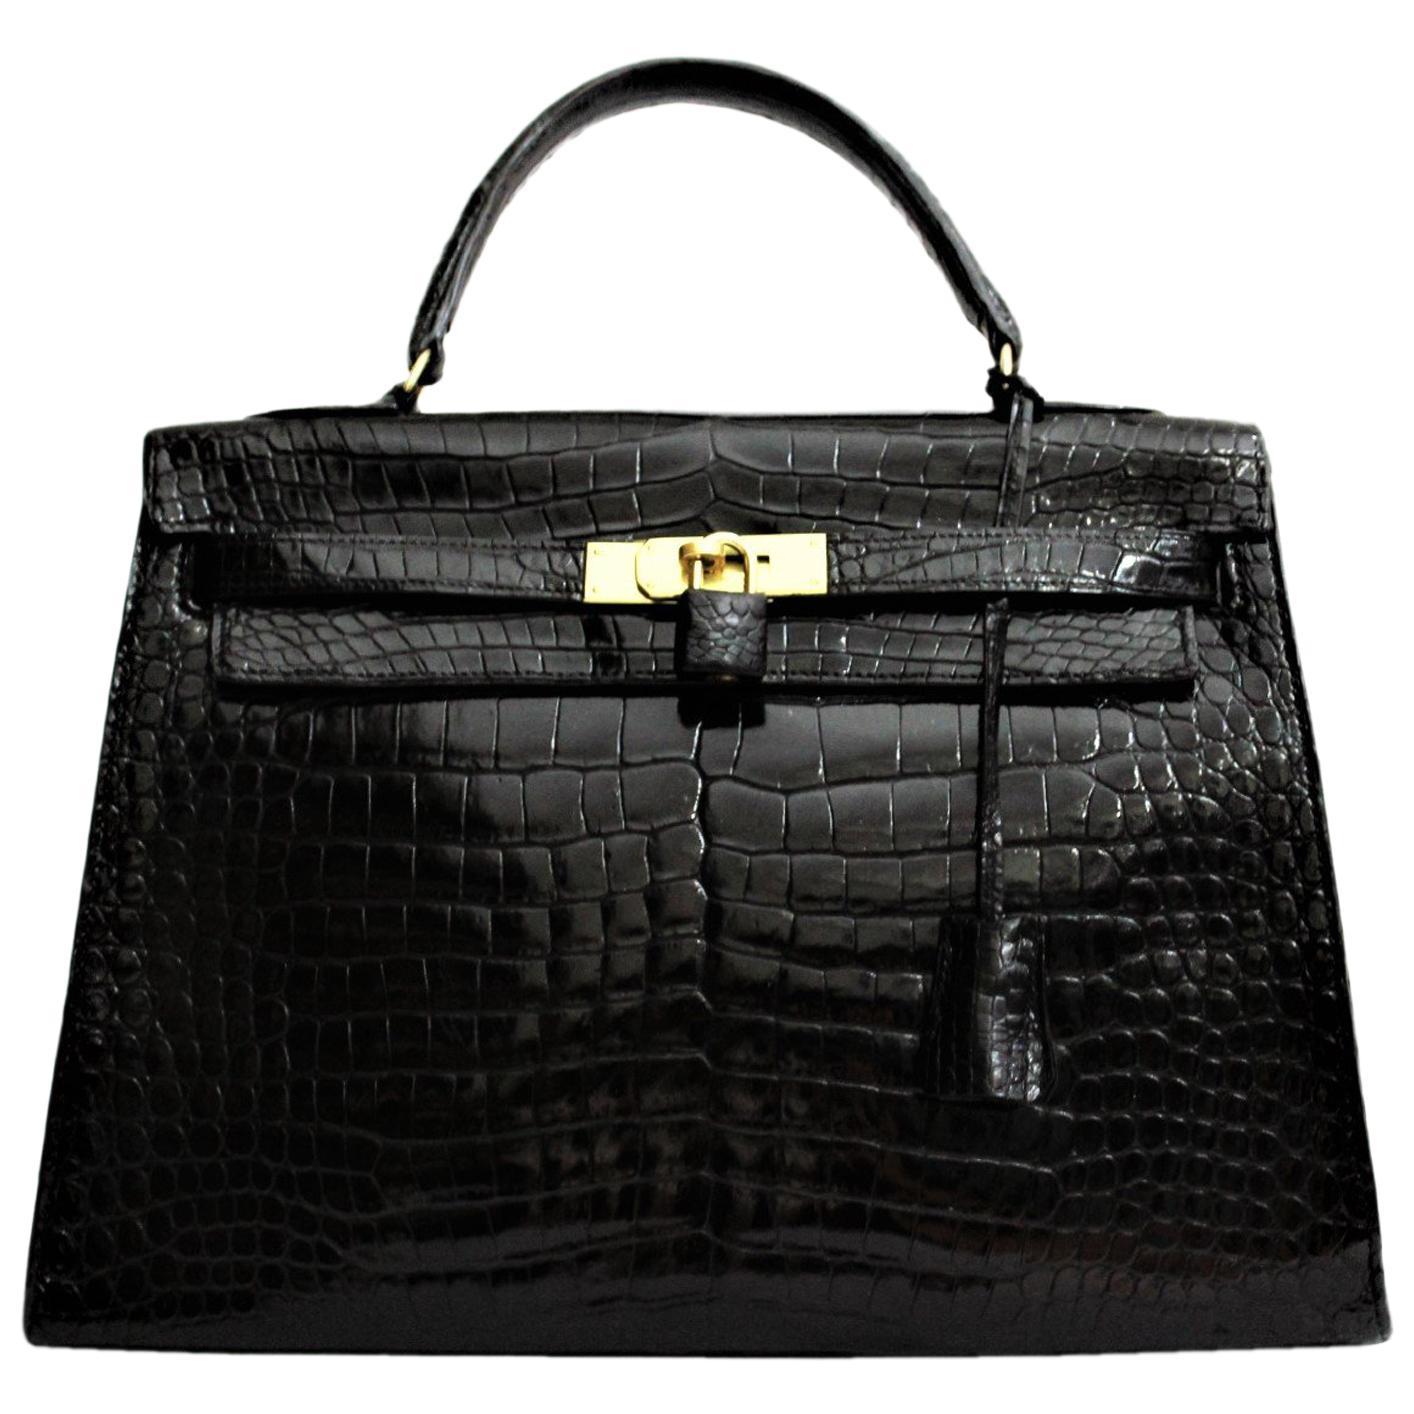 42252b538583 ... coupon code for hermès black crocodile leather kelly 32cm bag fa03e  dfdf3